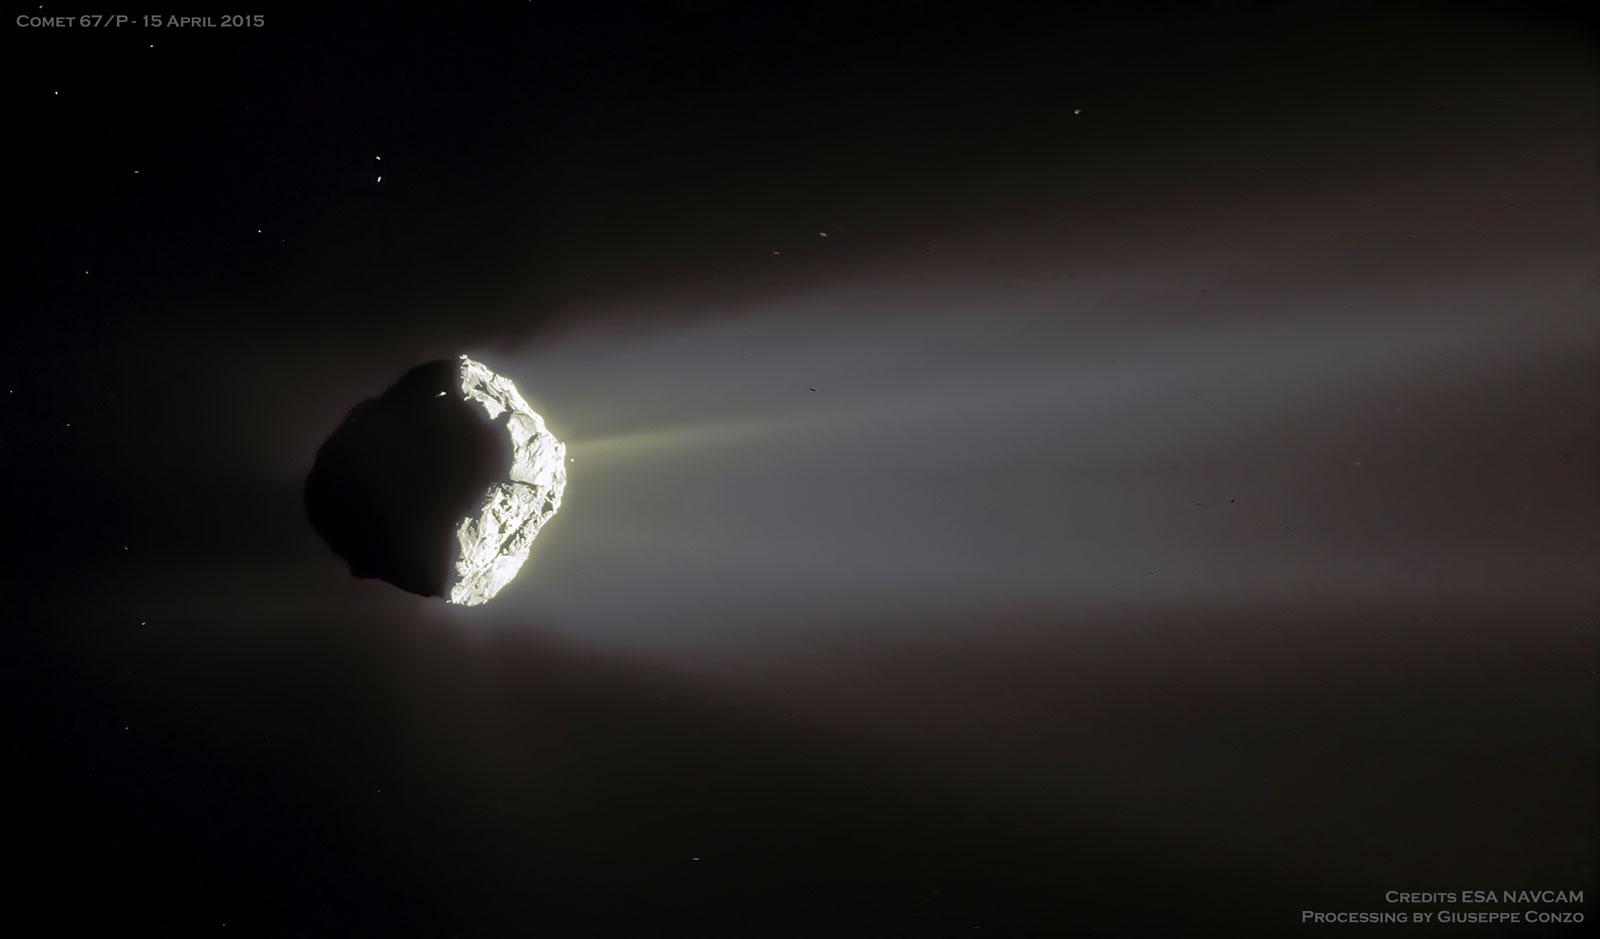 Cometa Churyumov-Gerasimenko